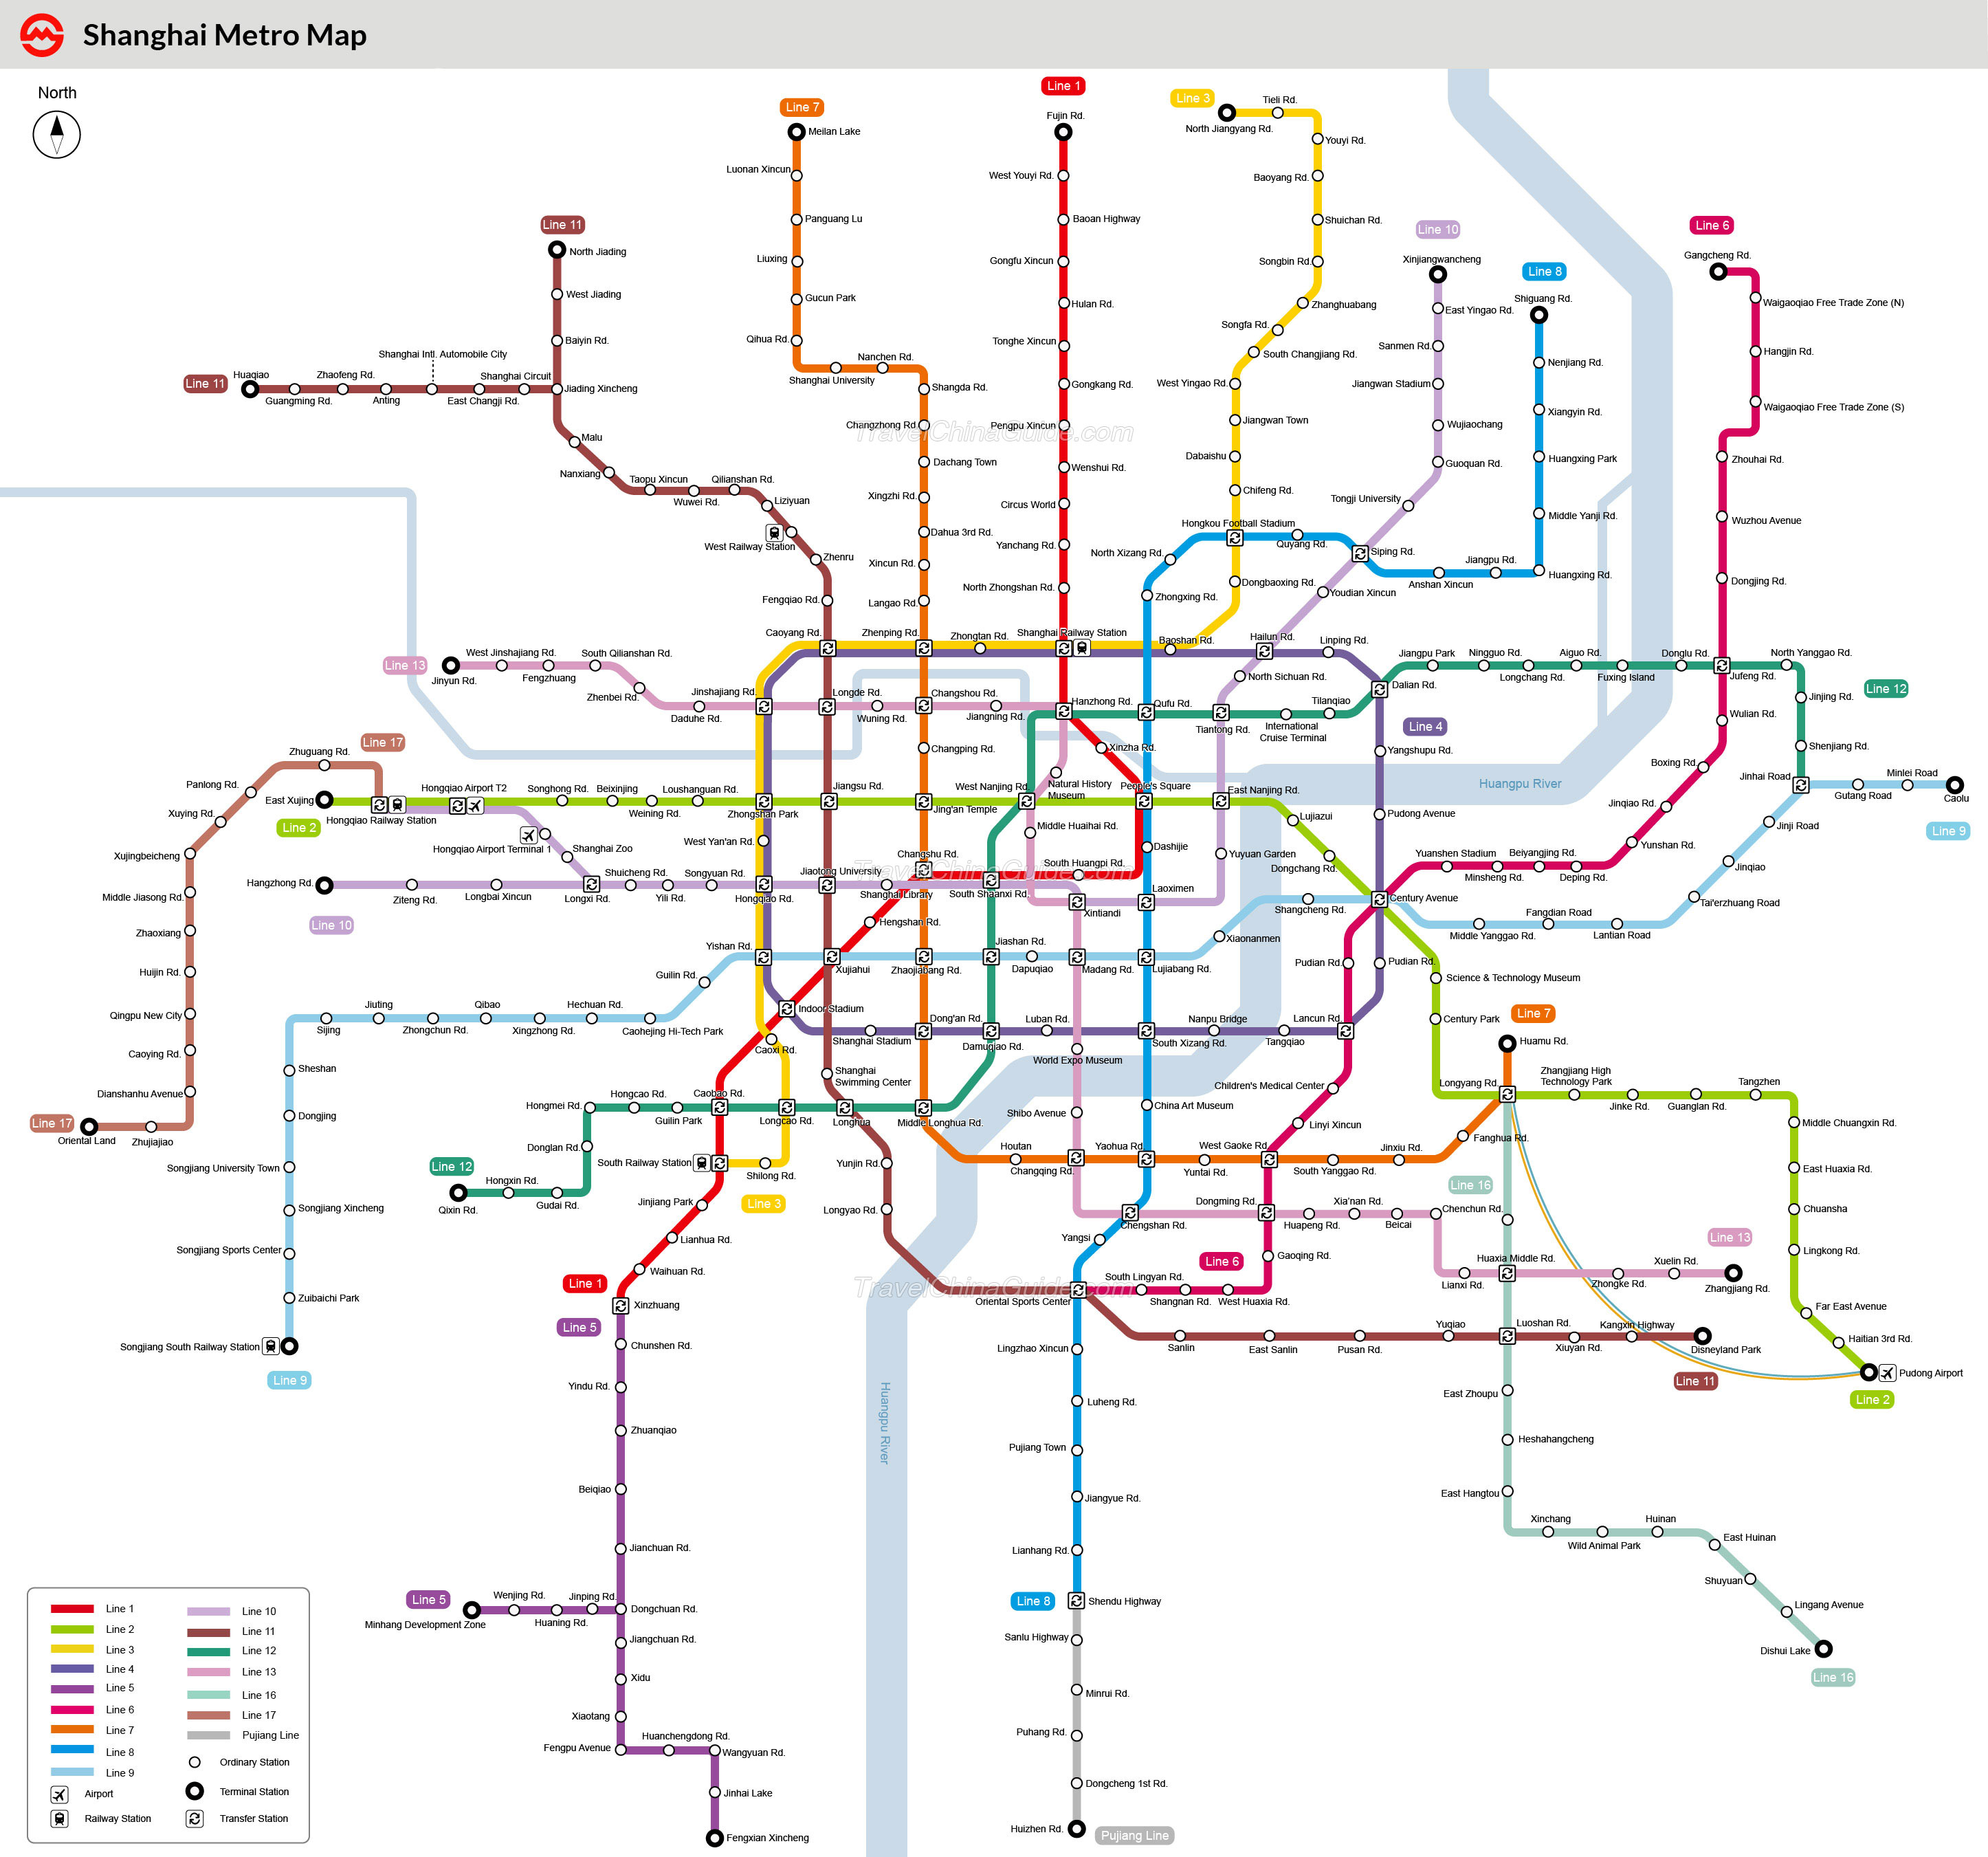 Shanghai Metro Maps, Printable Maps Of Subway, Pdf Download - Printable Subway Map